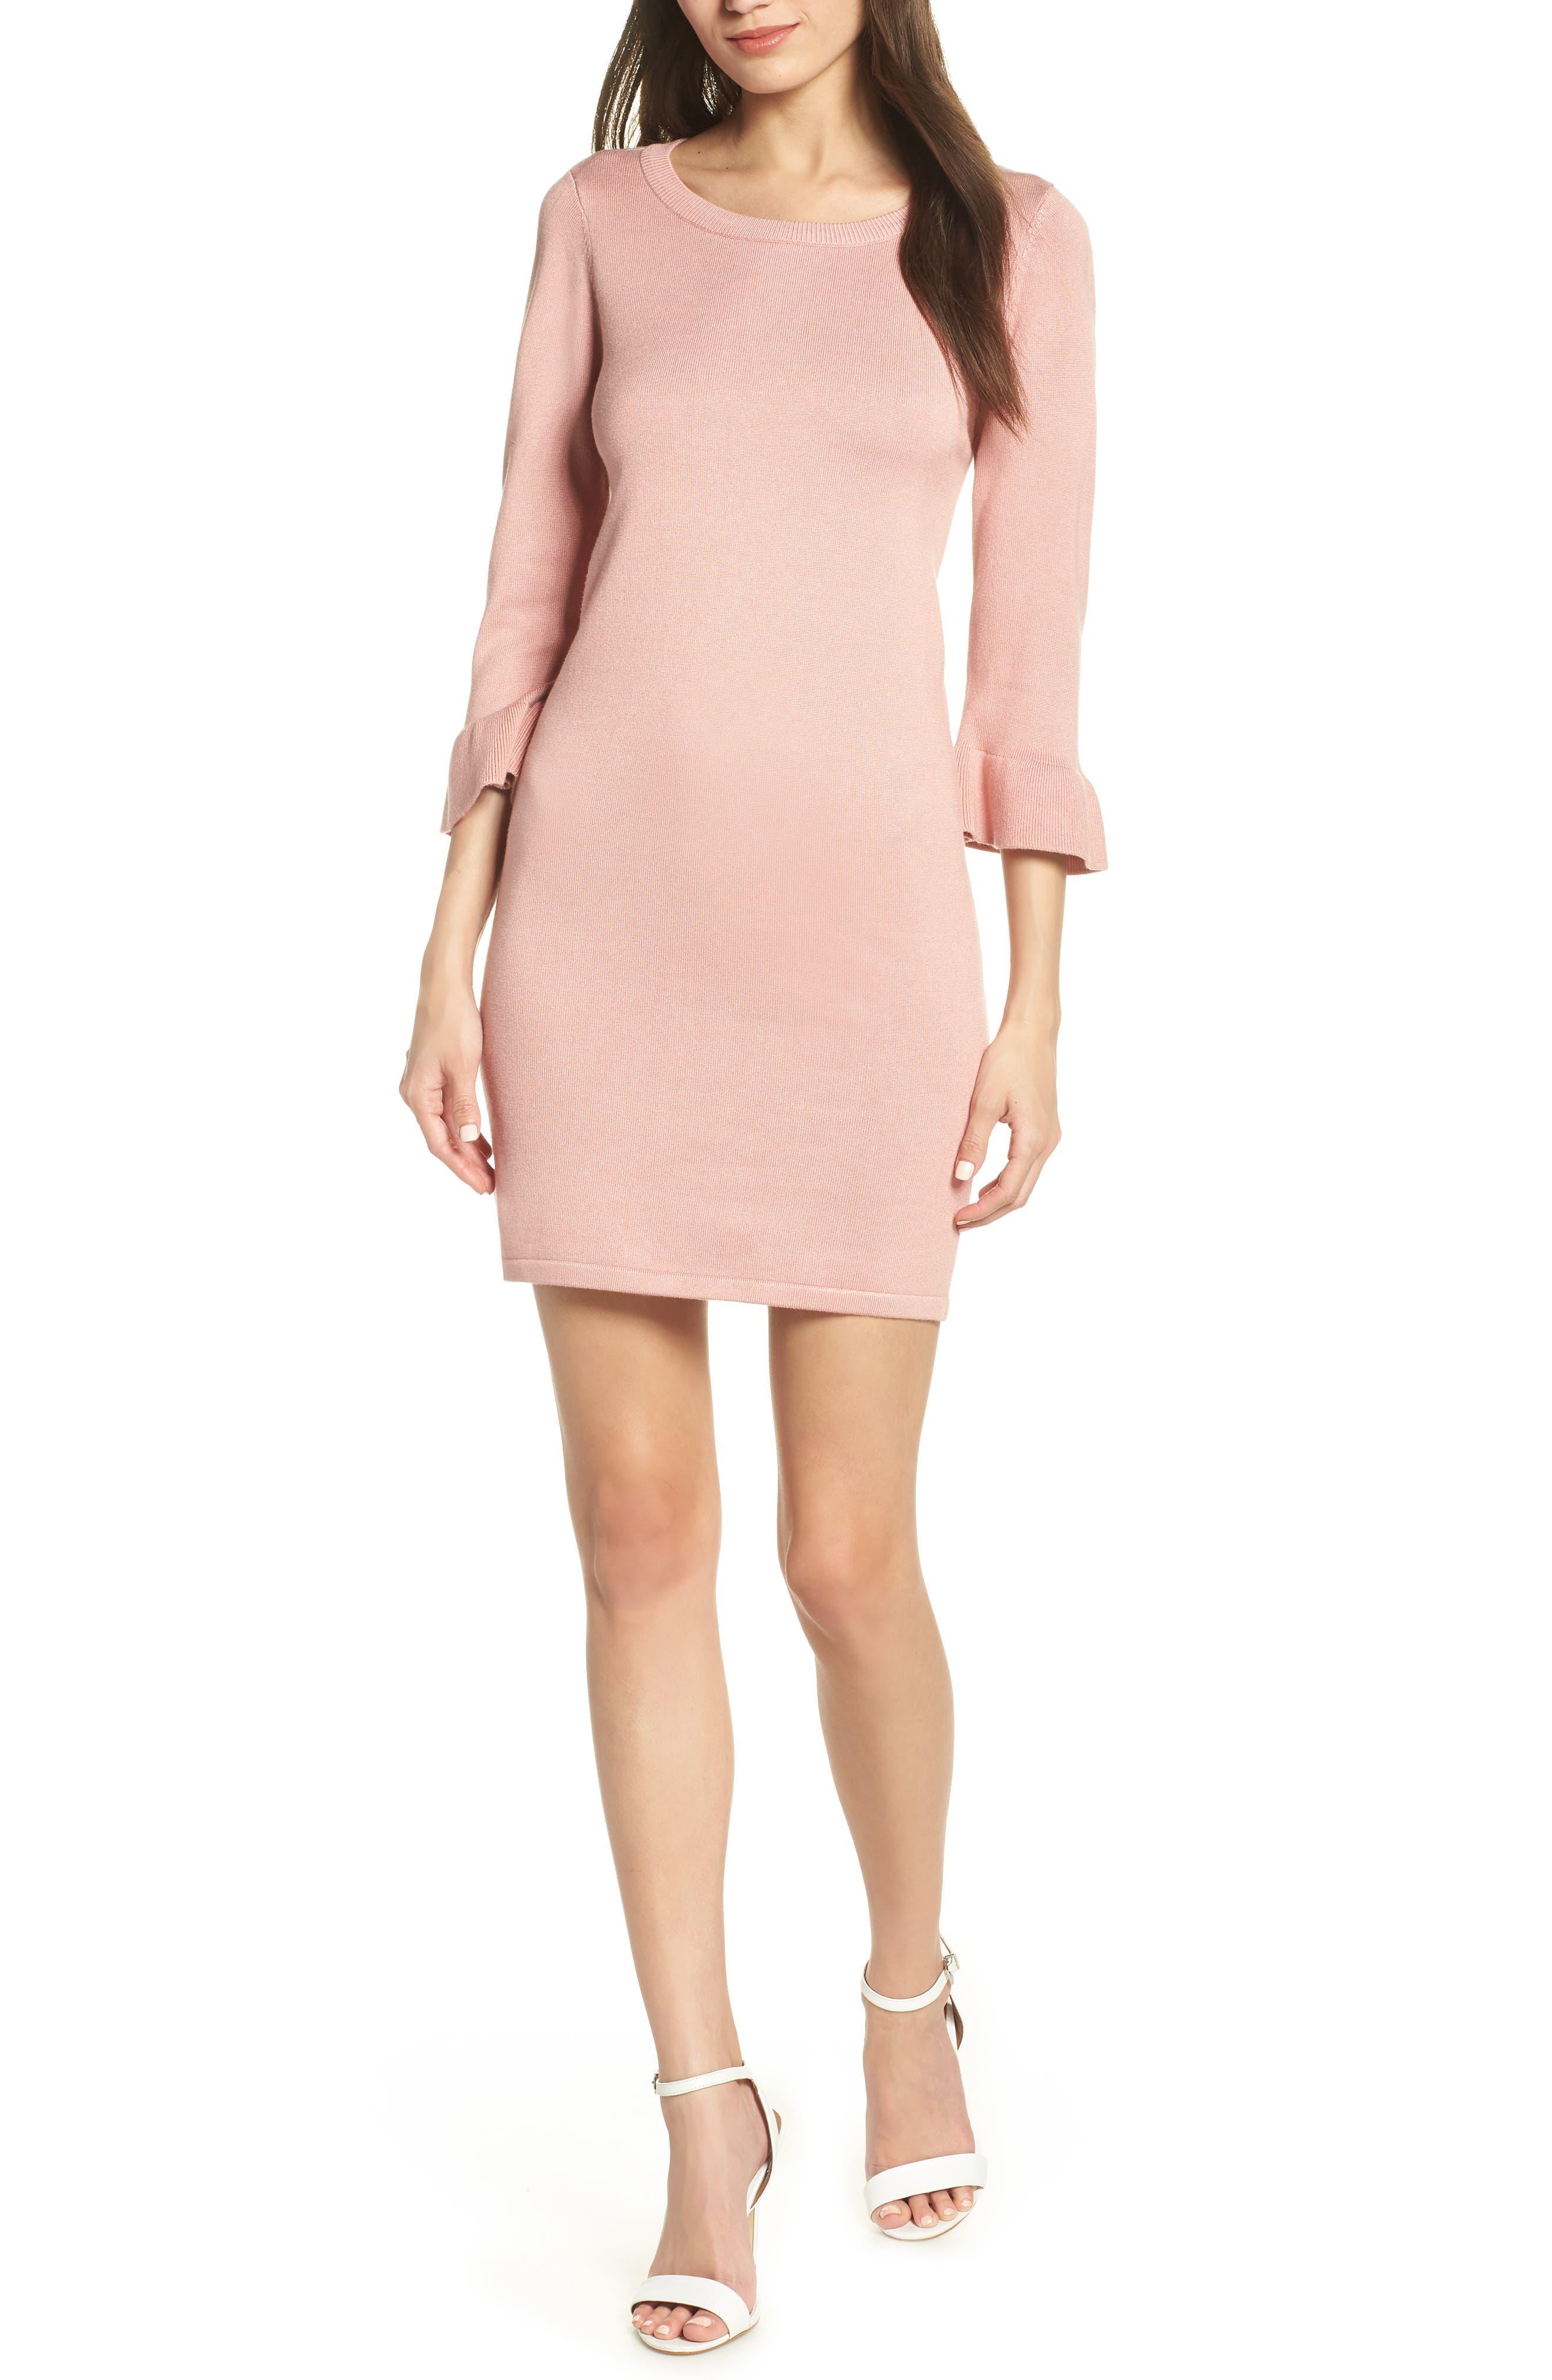 Bb Dakota Now Or Never Ruffle Sweater Dress, Pink